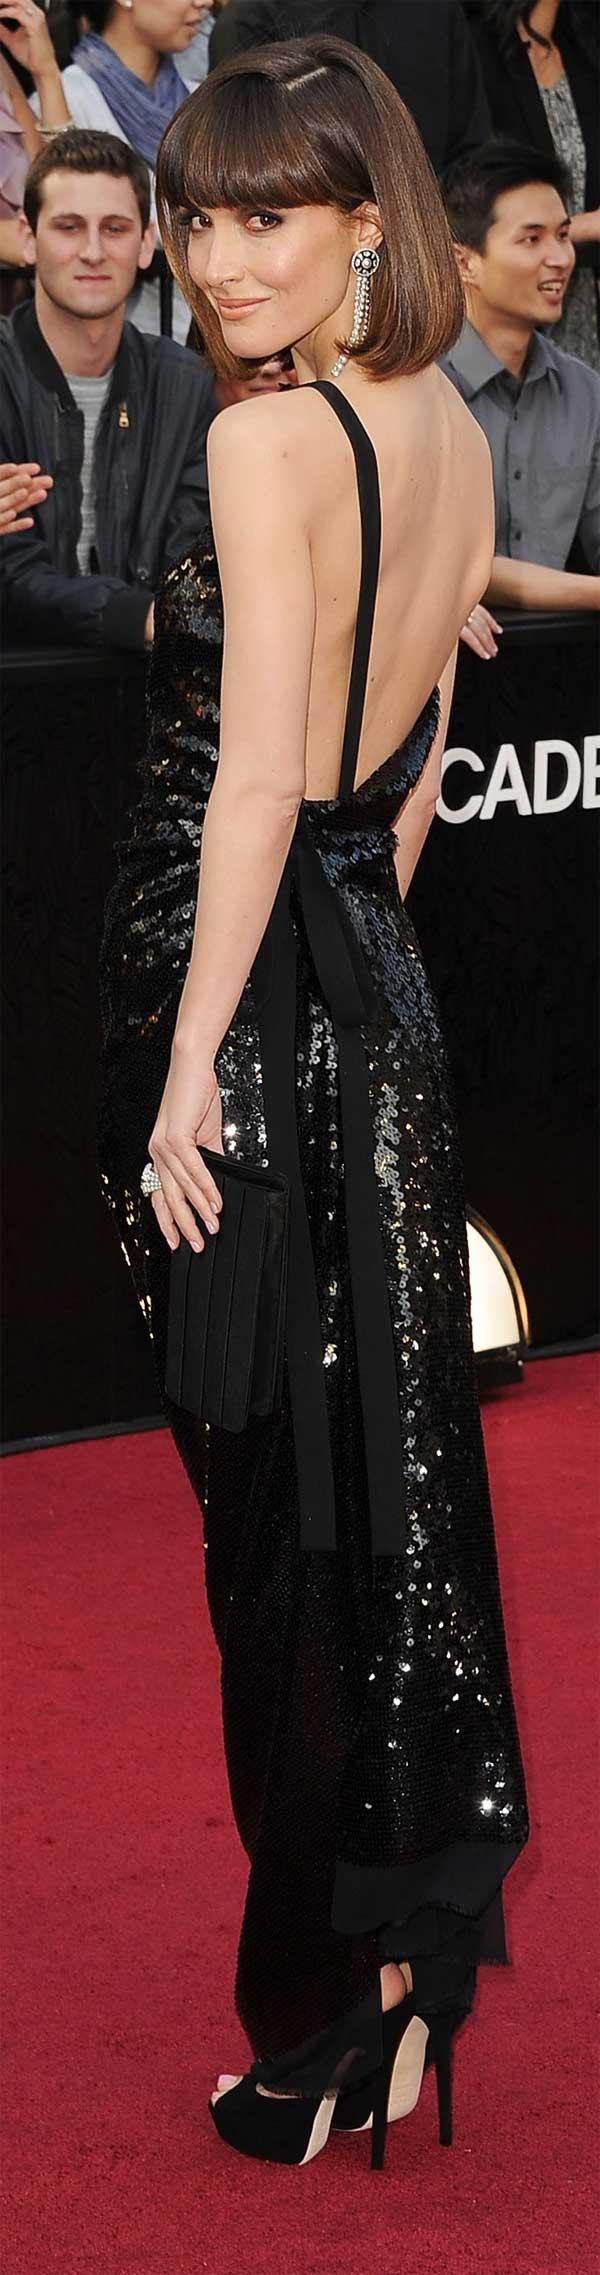 Rose Byrne 2012 84th Academy Awards